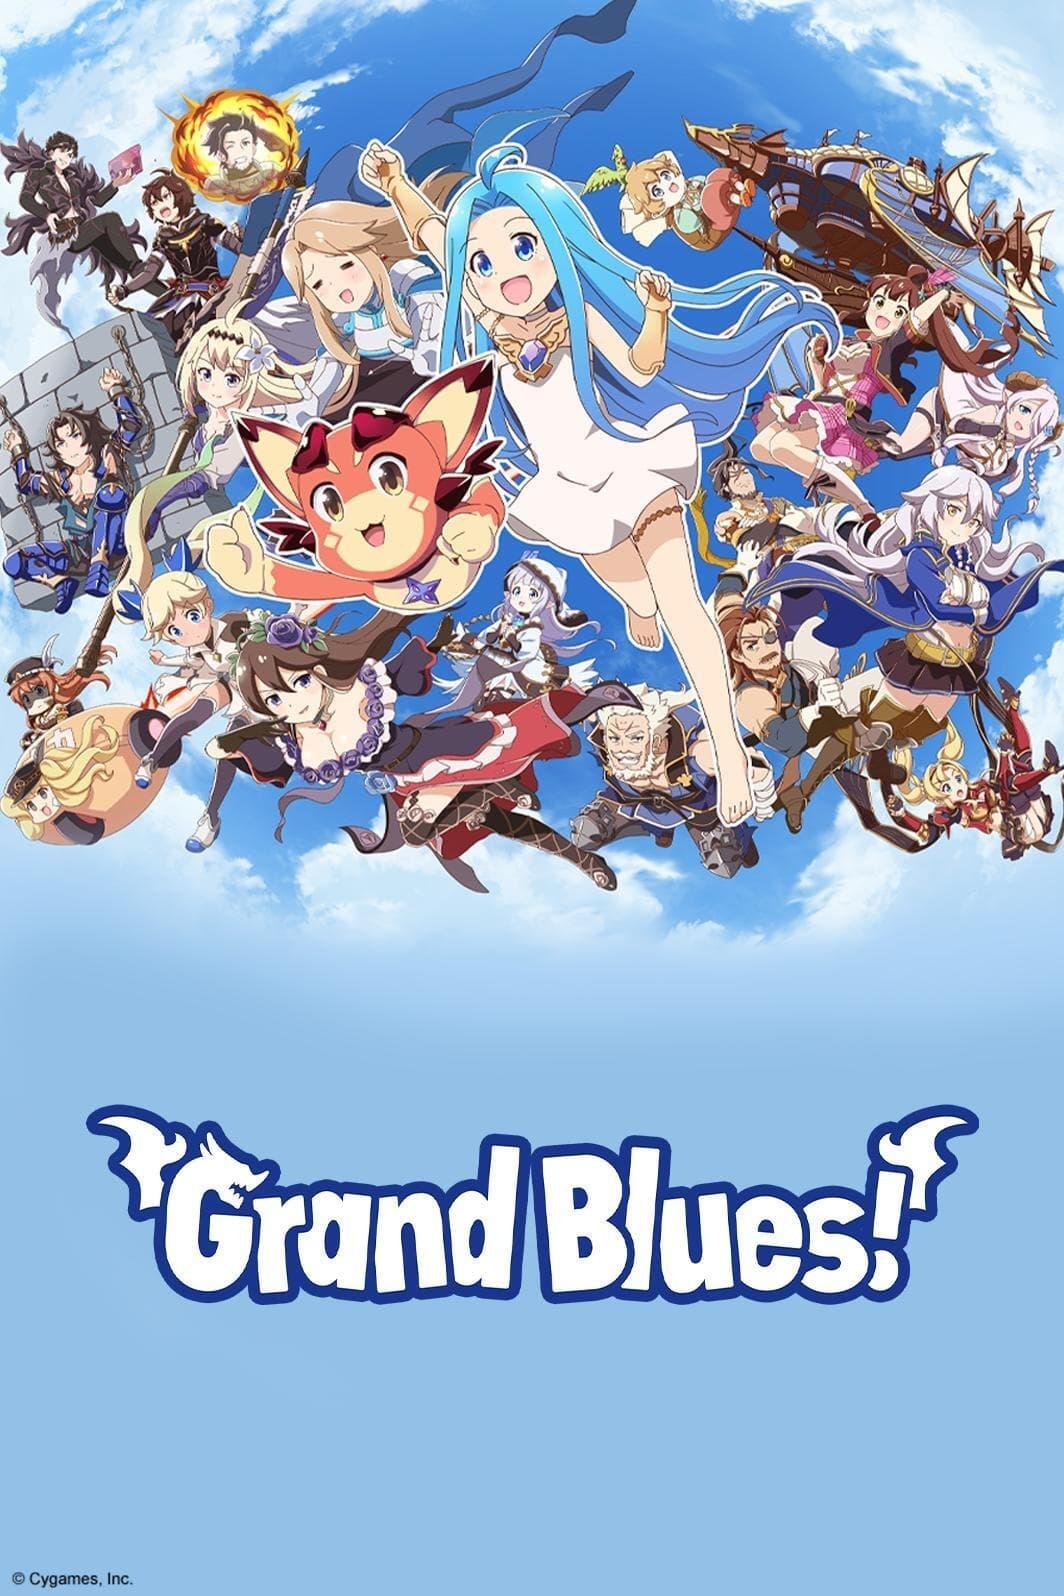 Grand Blues!